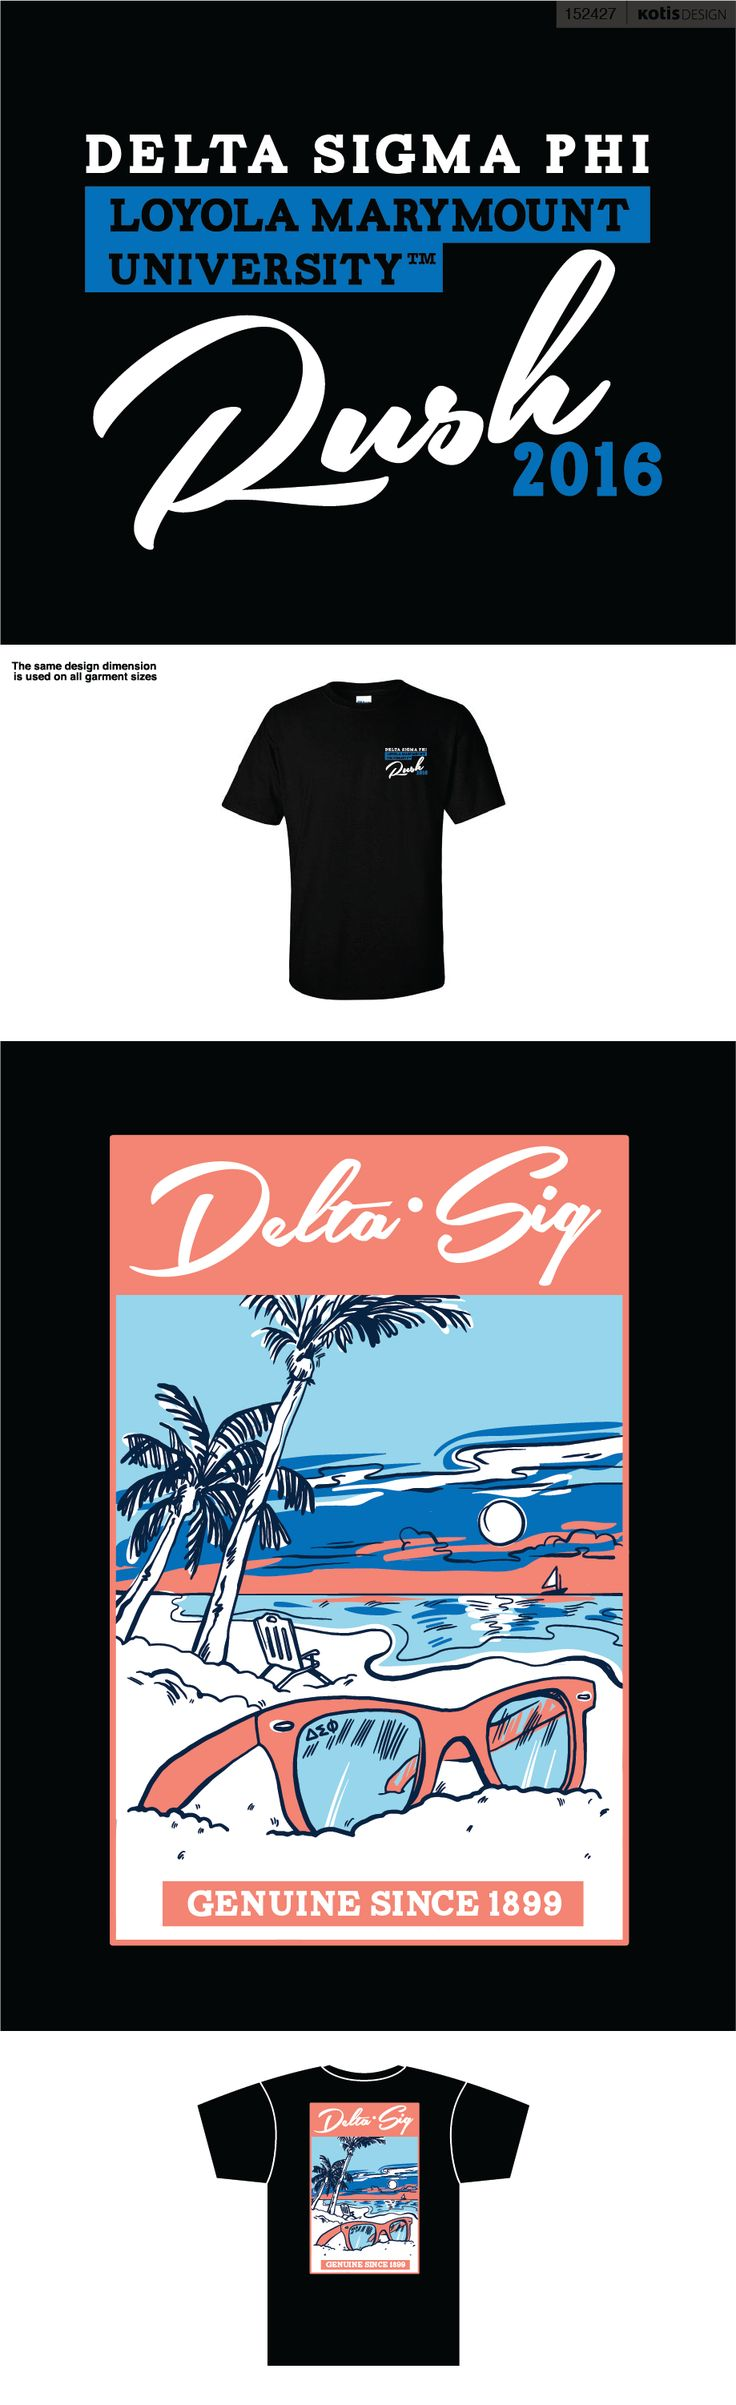 152427 - LMU DSig | Rush Shirts - View Proof - Kotis Design